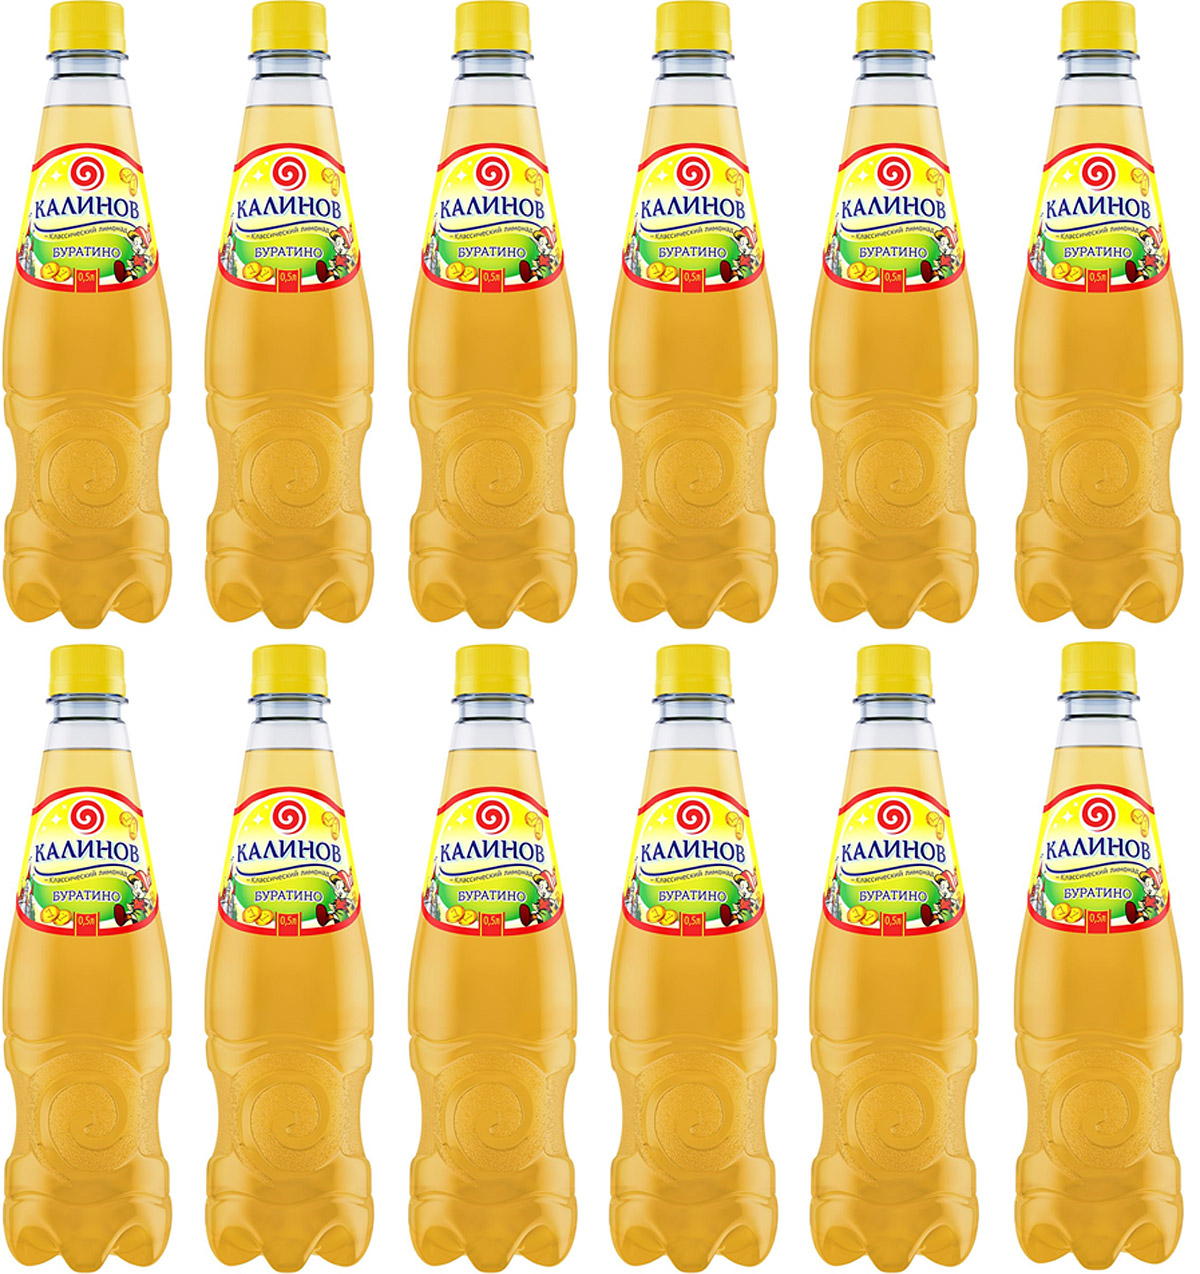 Калинов Лимонад Буратино, 12 шт по 0,5 л калинов лимонад буратино 12 шт по 0 5 л